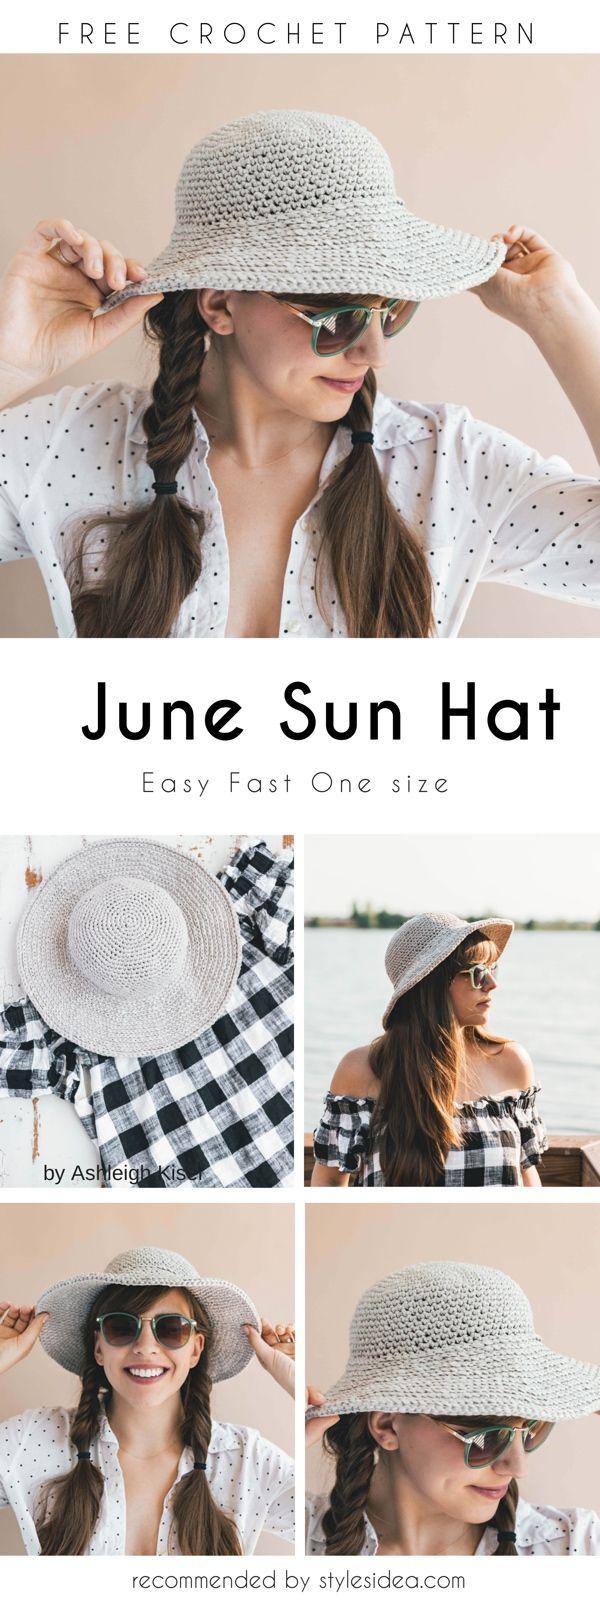 840 best σκουφια γαντια images on Pinterest | Crocheted hats ...